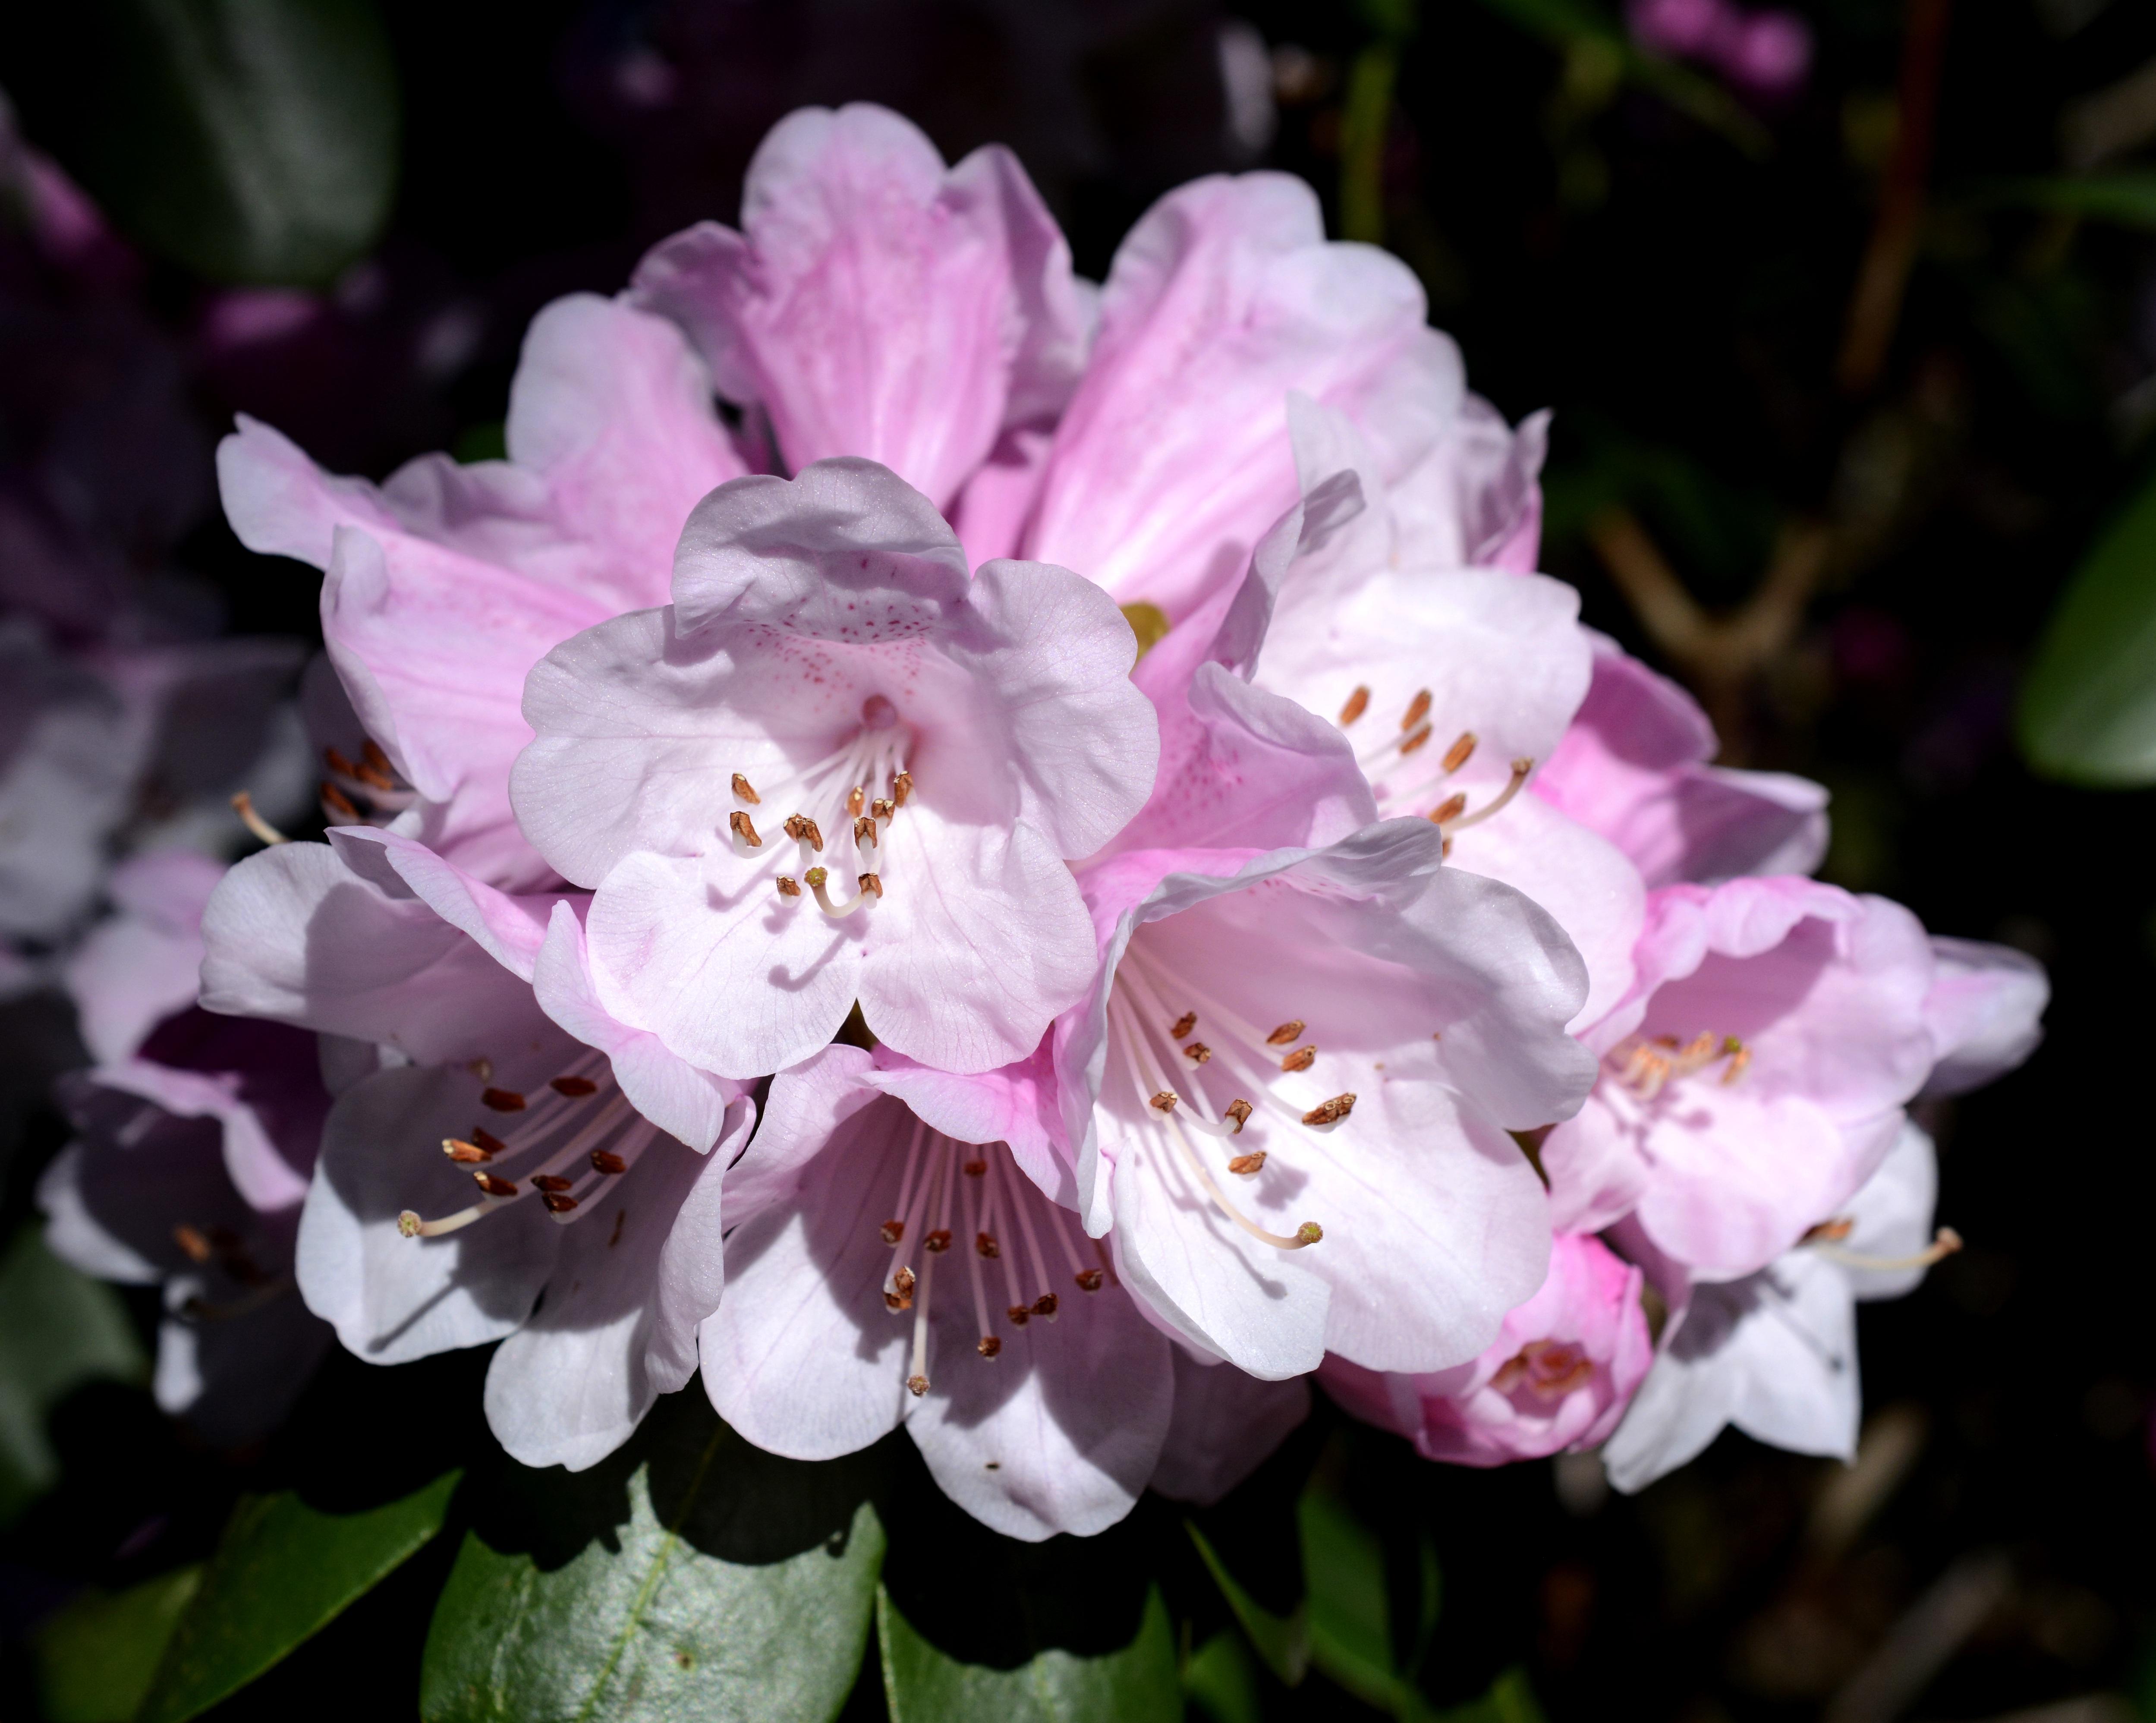 Free Images Nature Blossom White Flower Petal Spring Botany